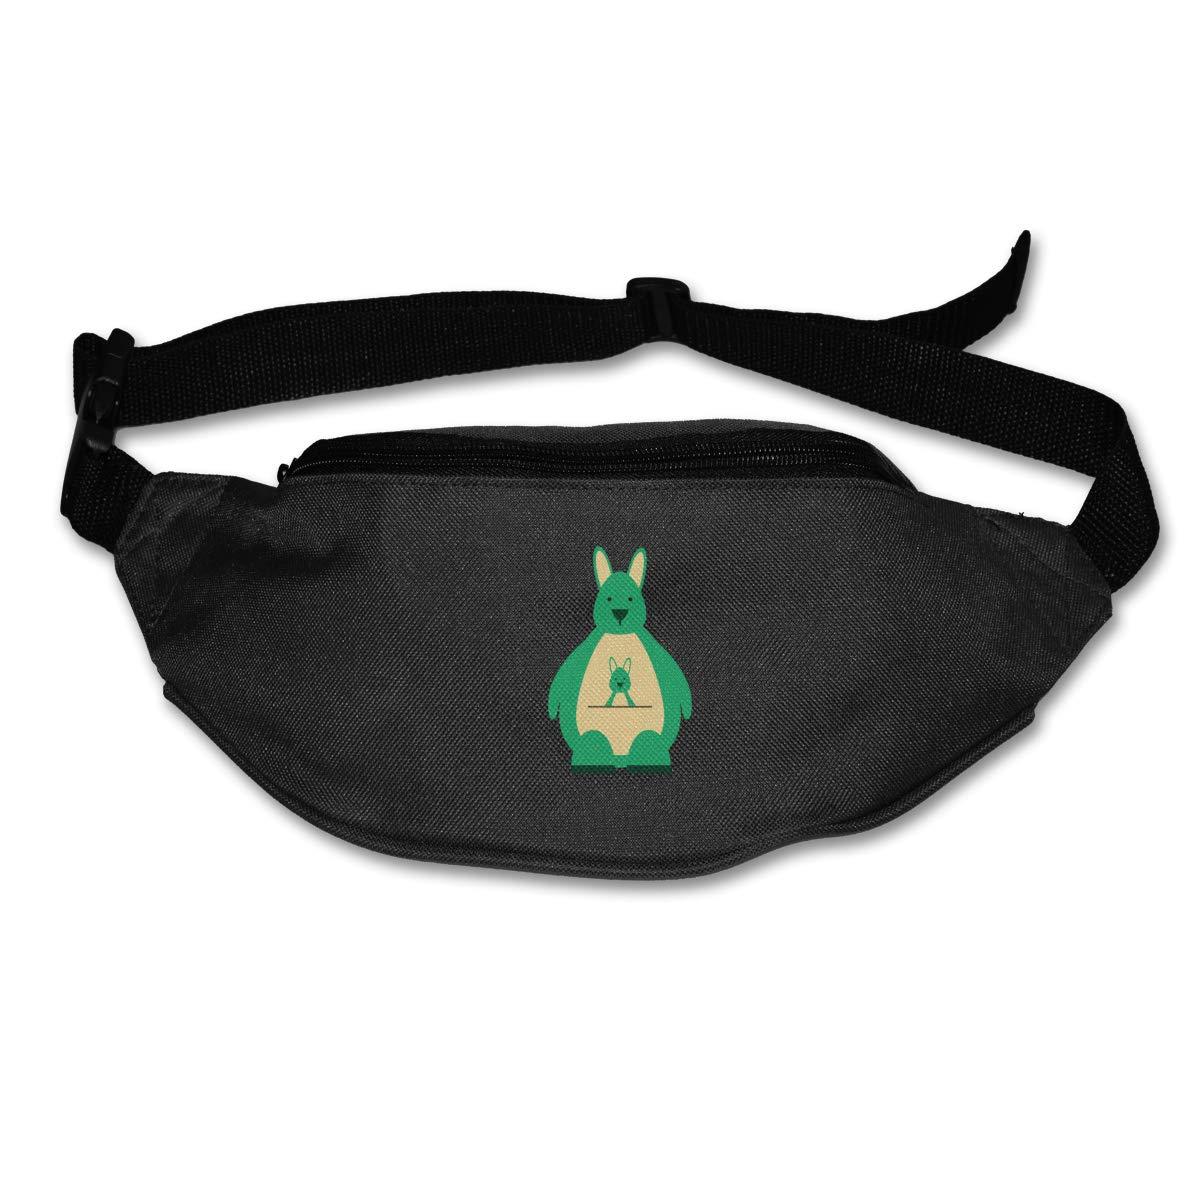 Green Cute Kangaroo Baby Sport Waist Bag Fanny Pack Adjustable For Run